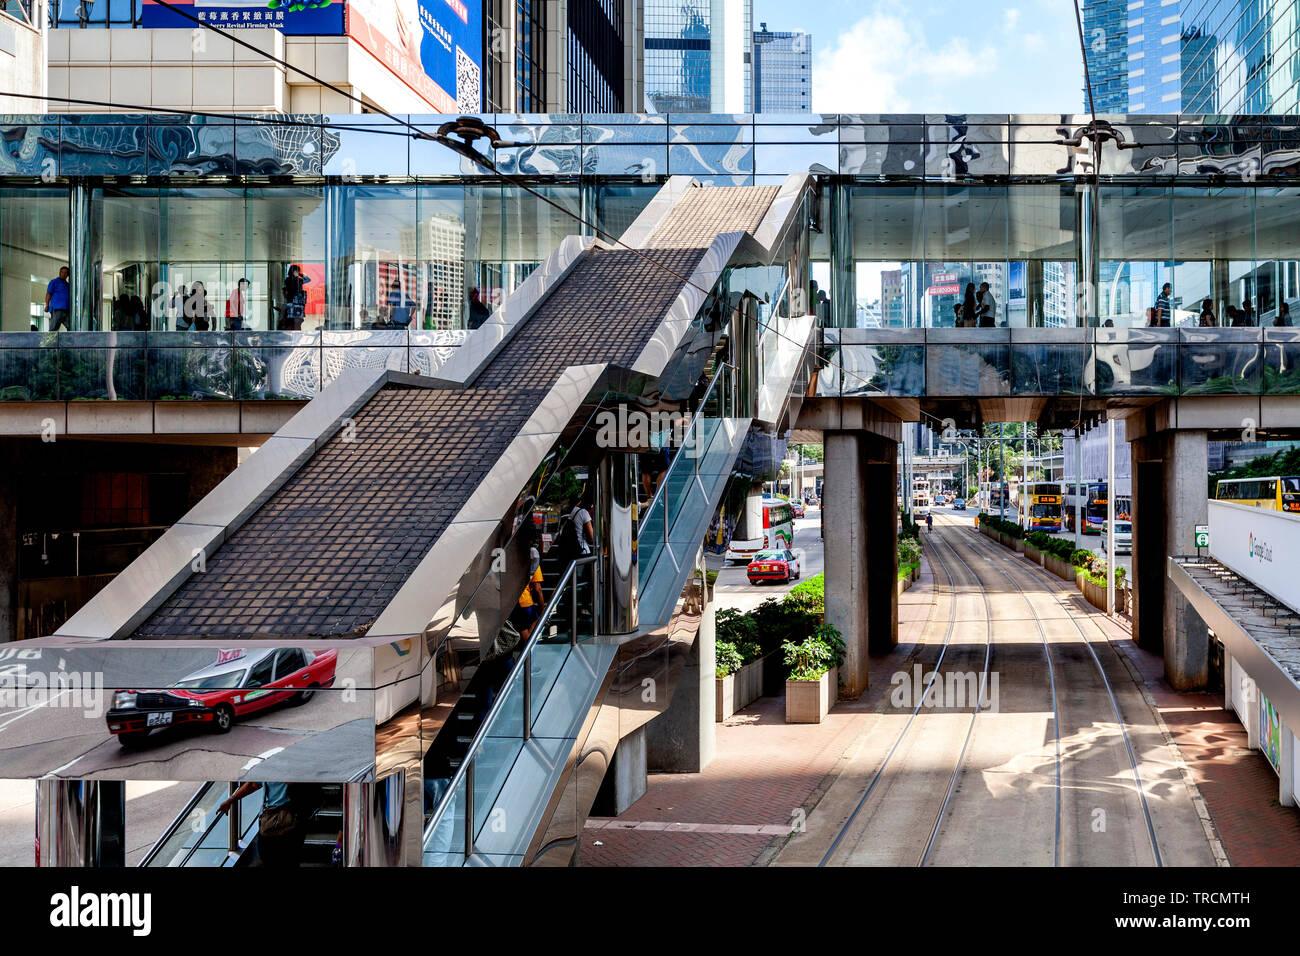 Pedestrian Overpass and Hong Kong Skyline, Hong Kong, China Stock Photo